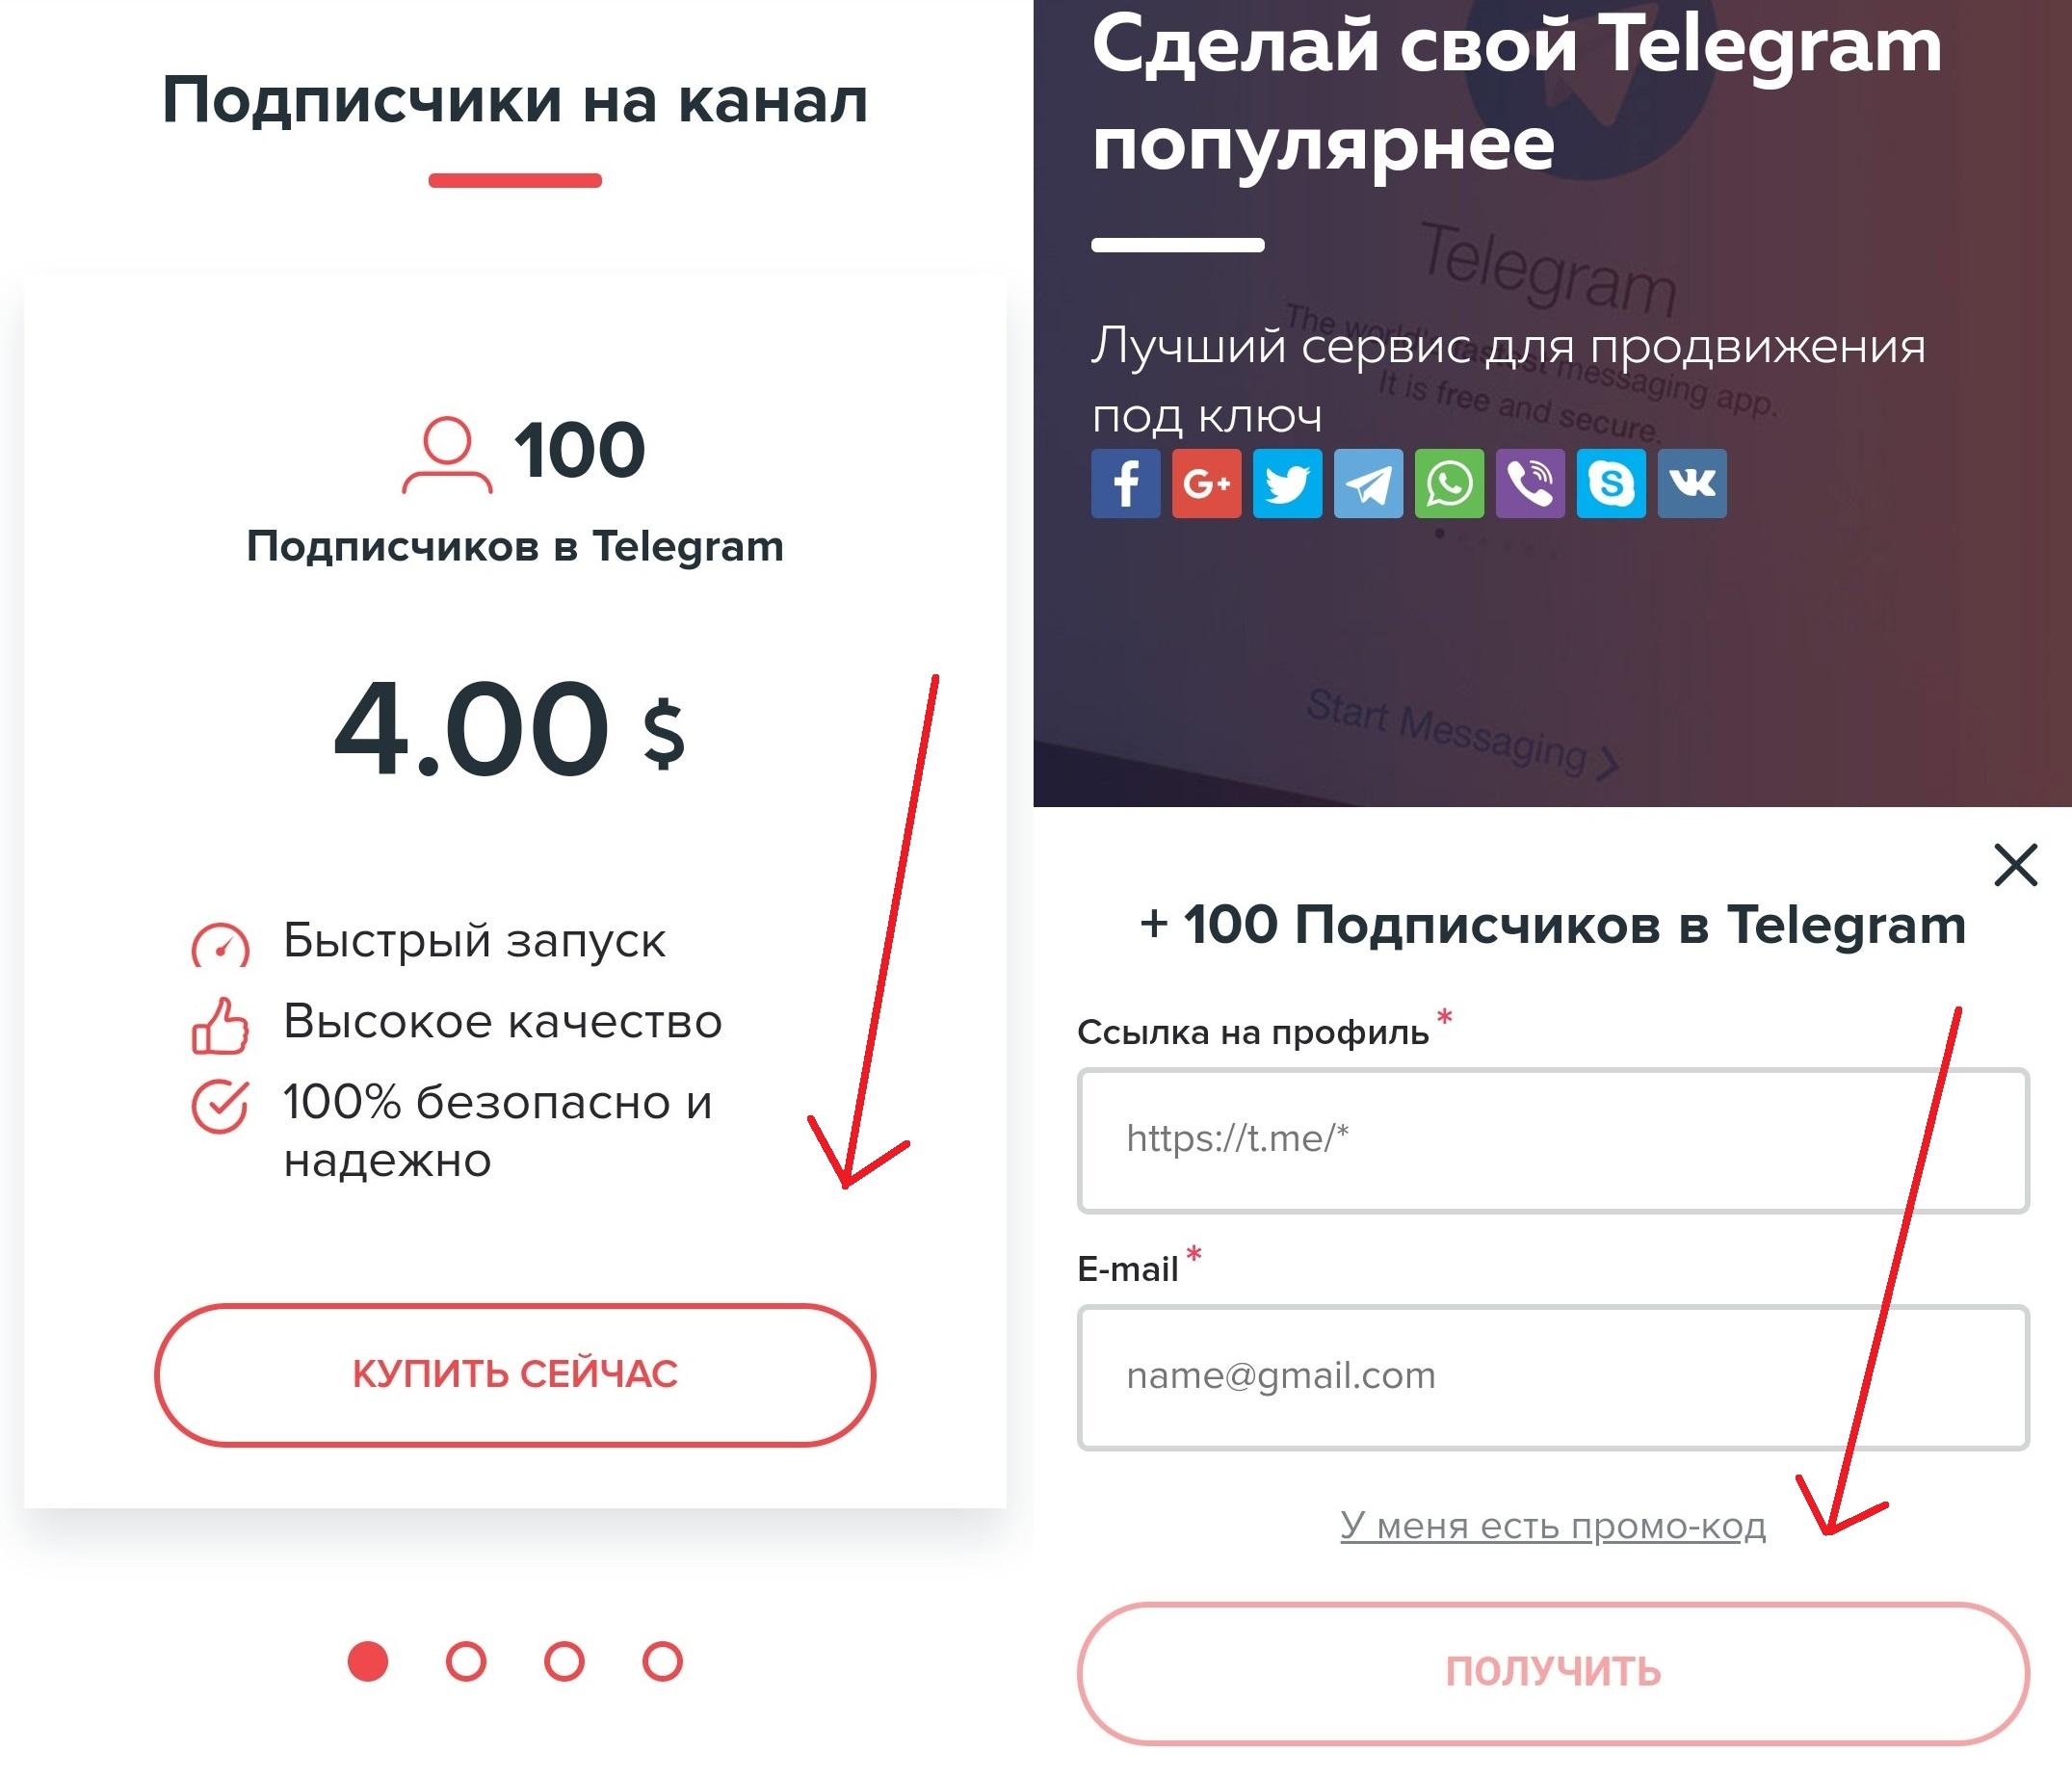 Подписчики Телеграм